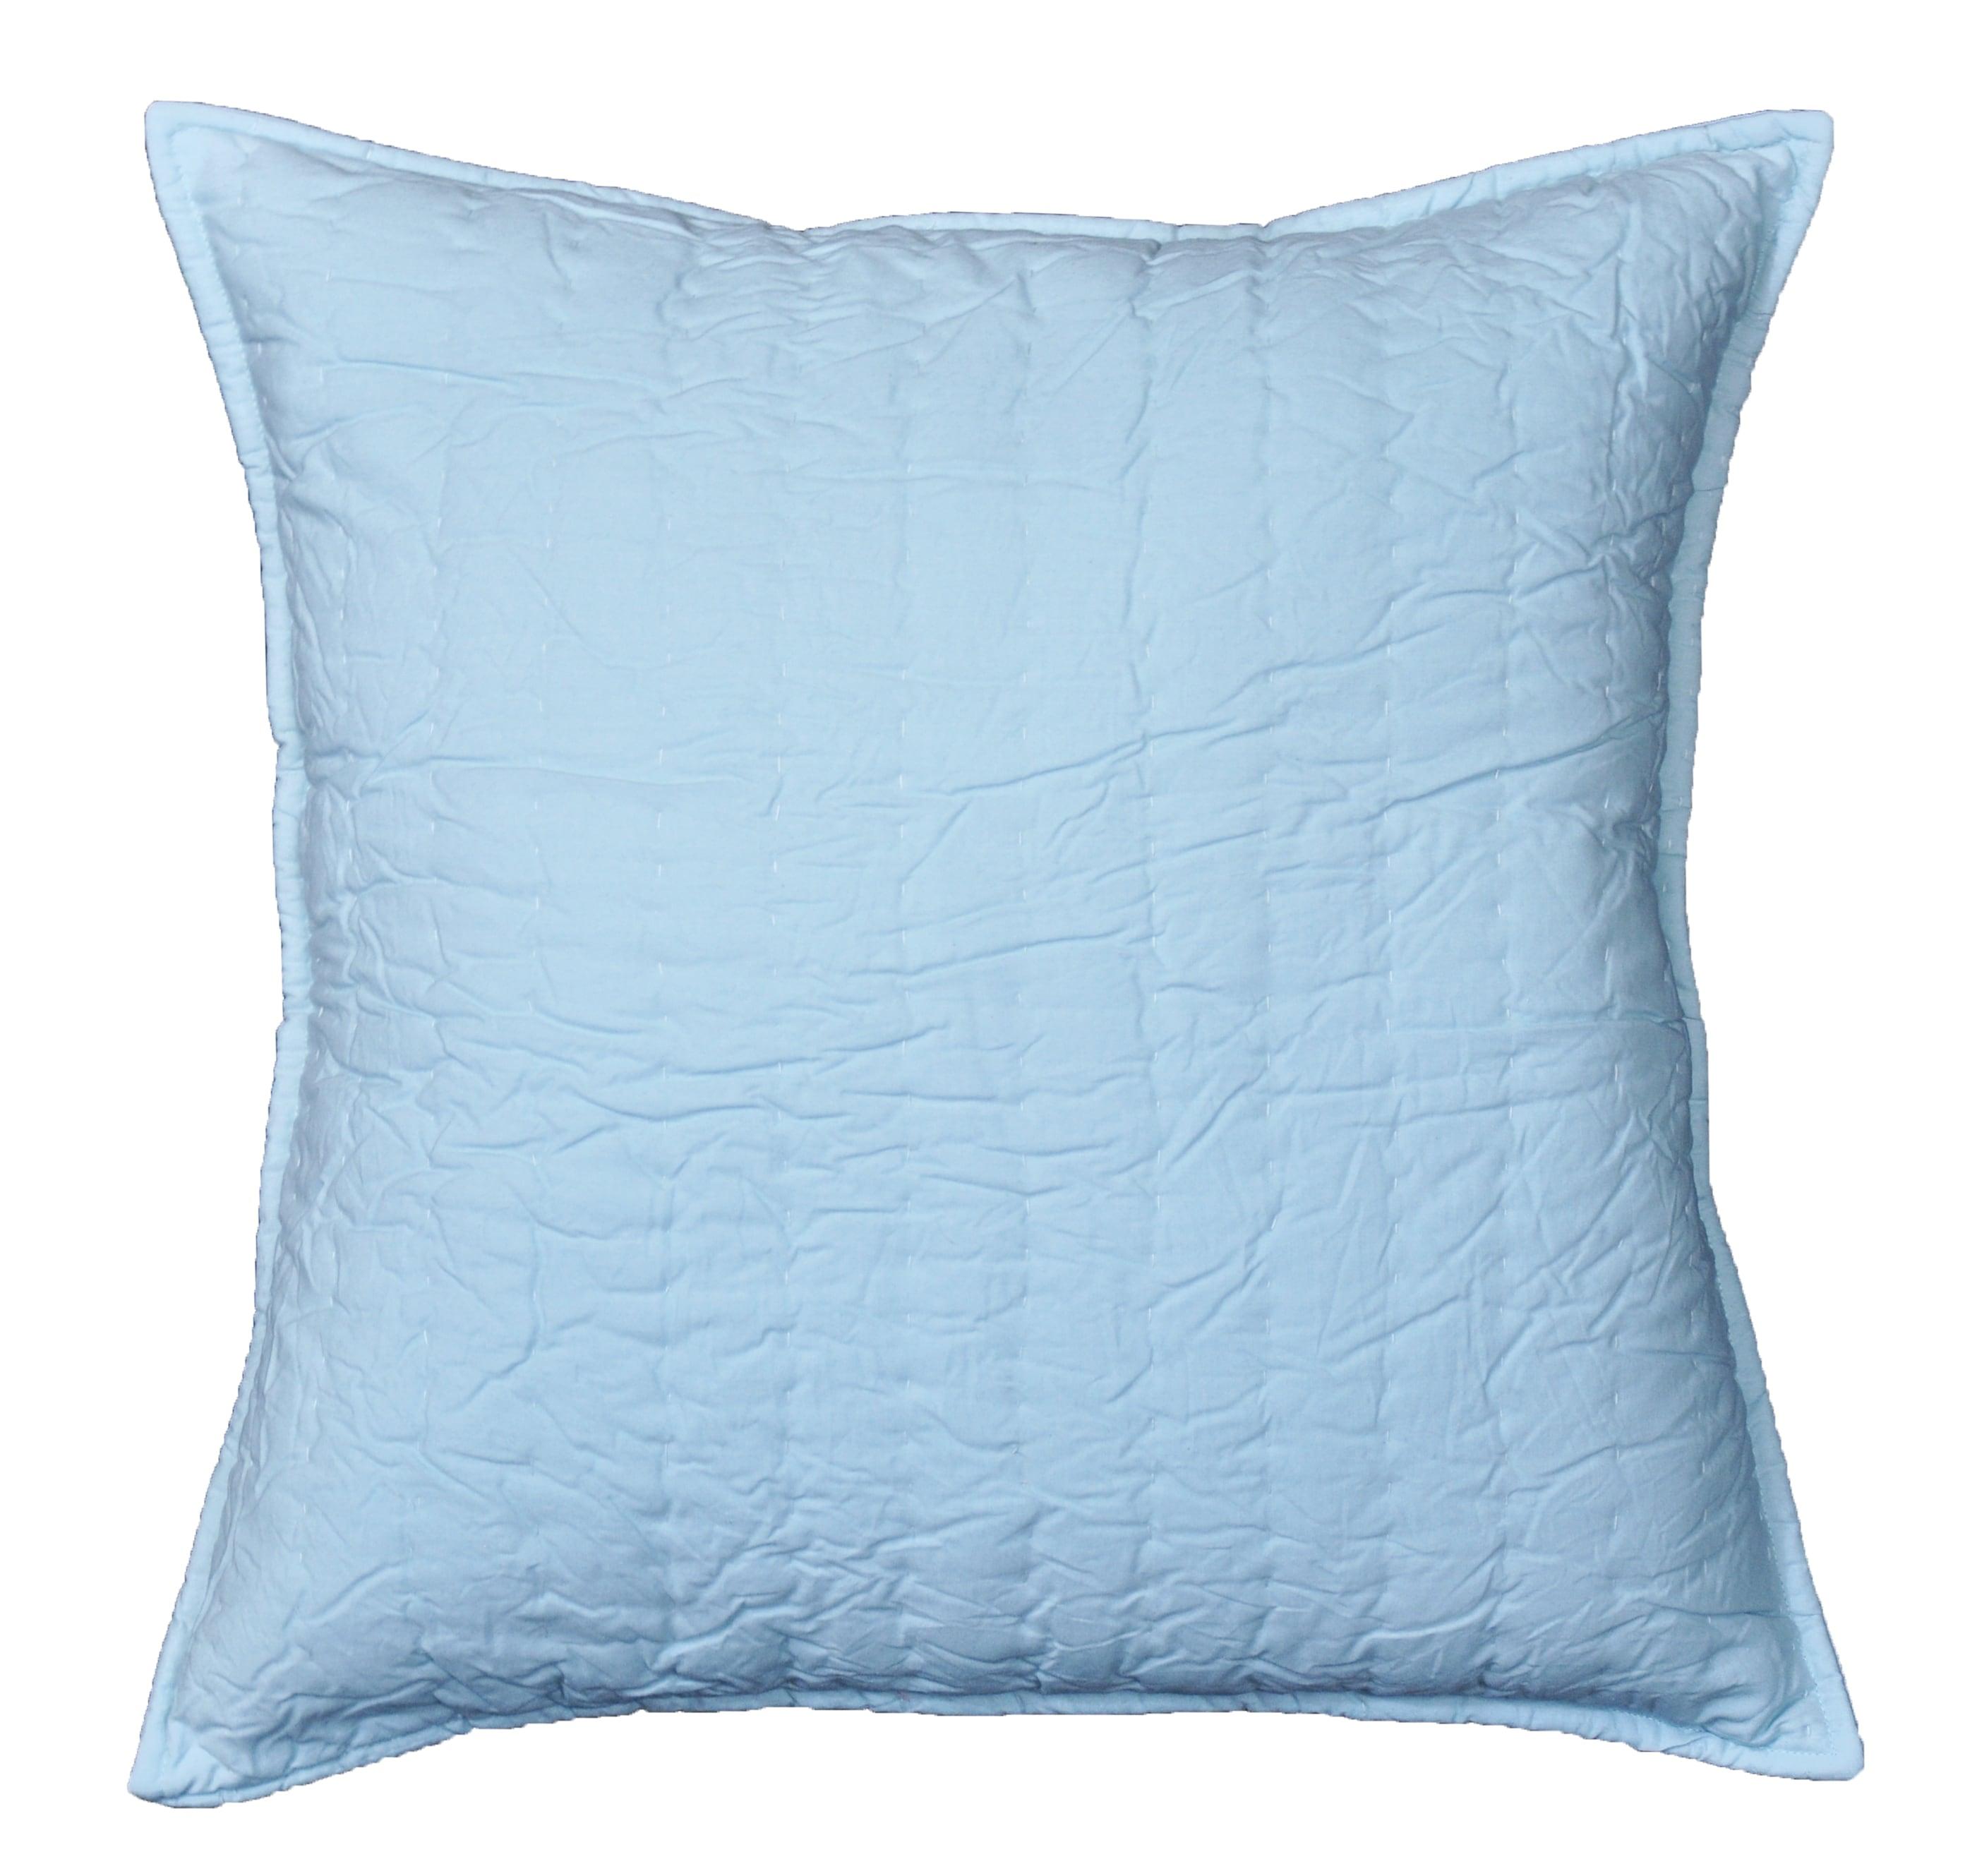 Brighton Blue Decorative Pillow